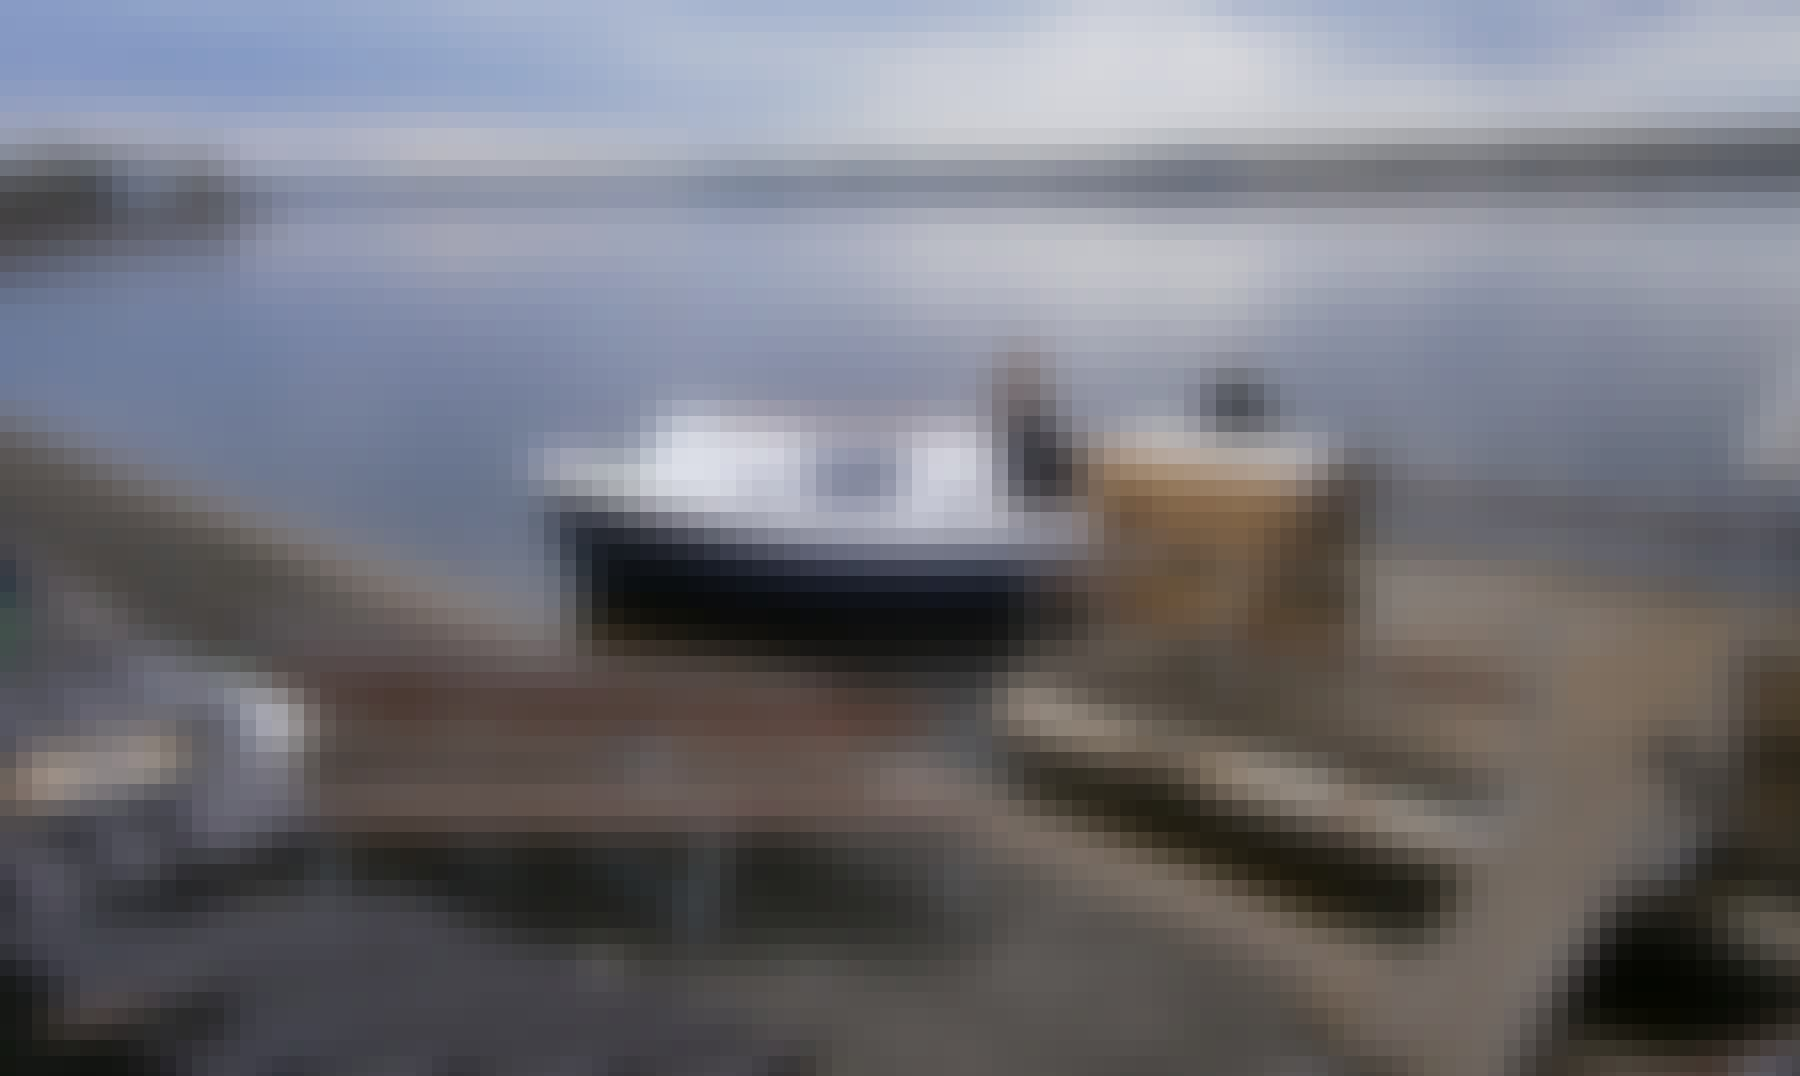 Rent a Passenger Boat in Ikšķile, Latvia